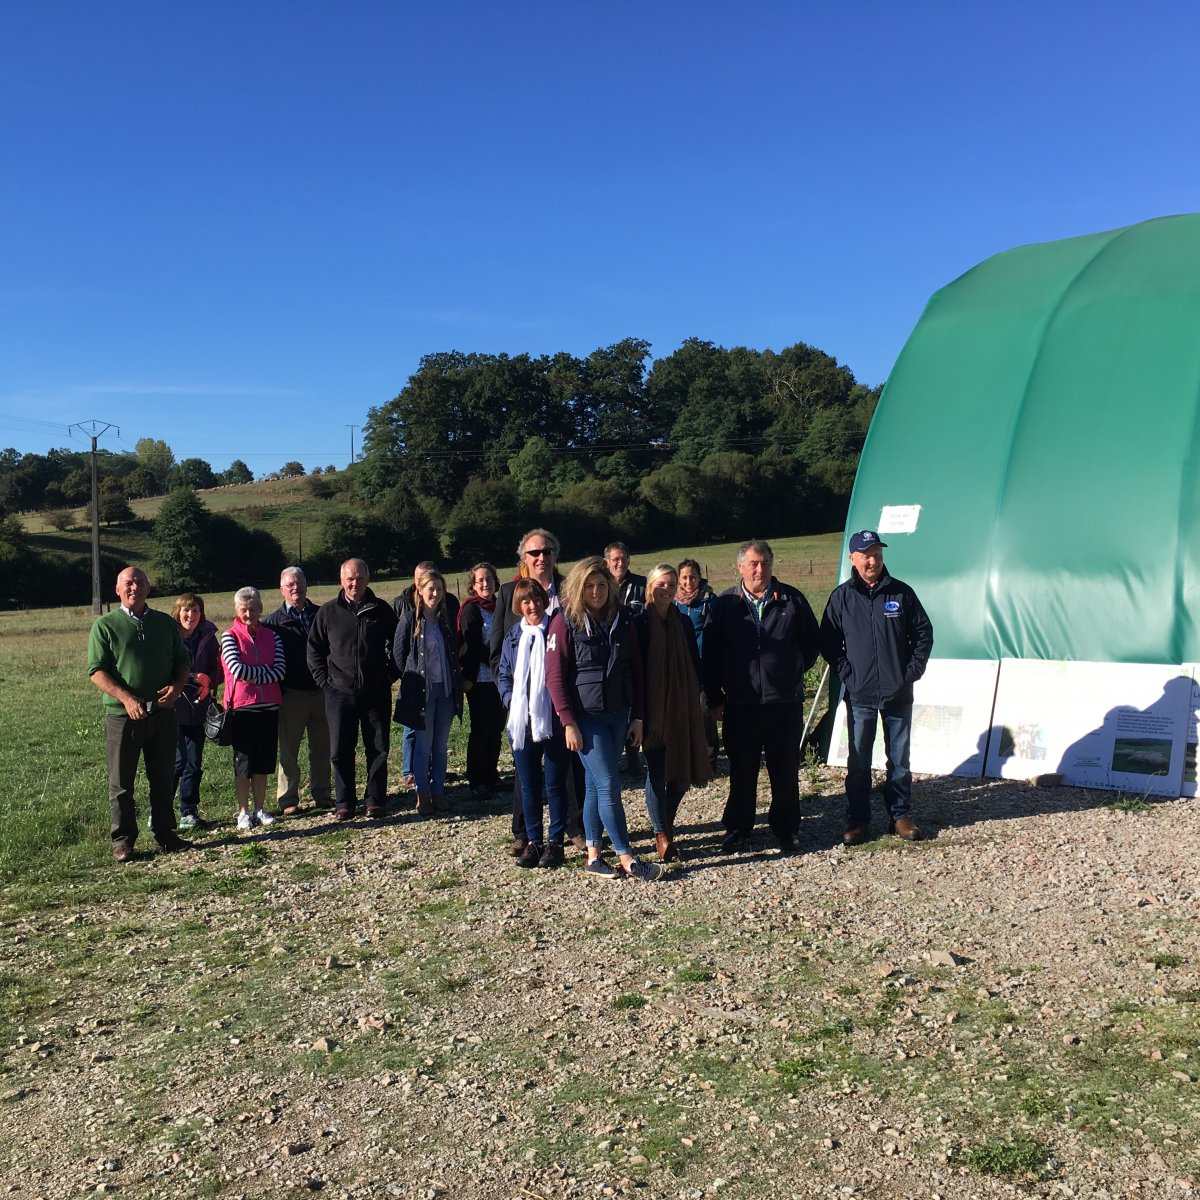 NSA members arrive at Du Mourier Farm near Limoges